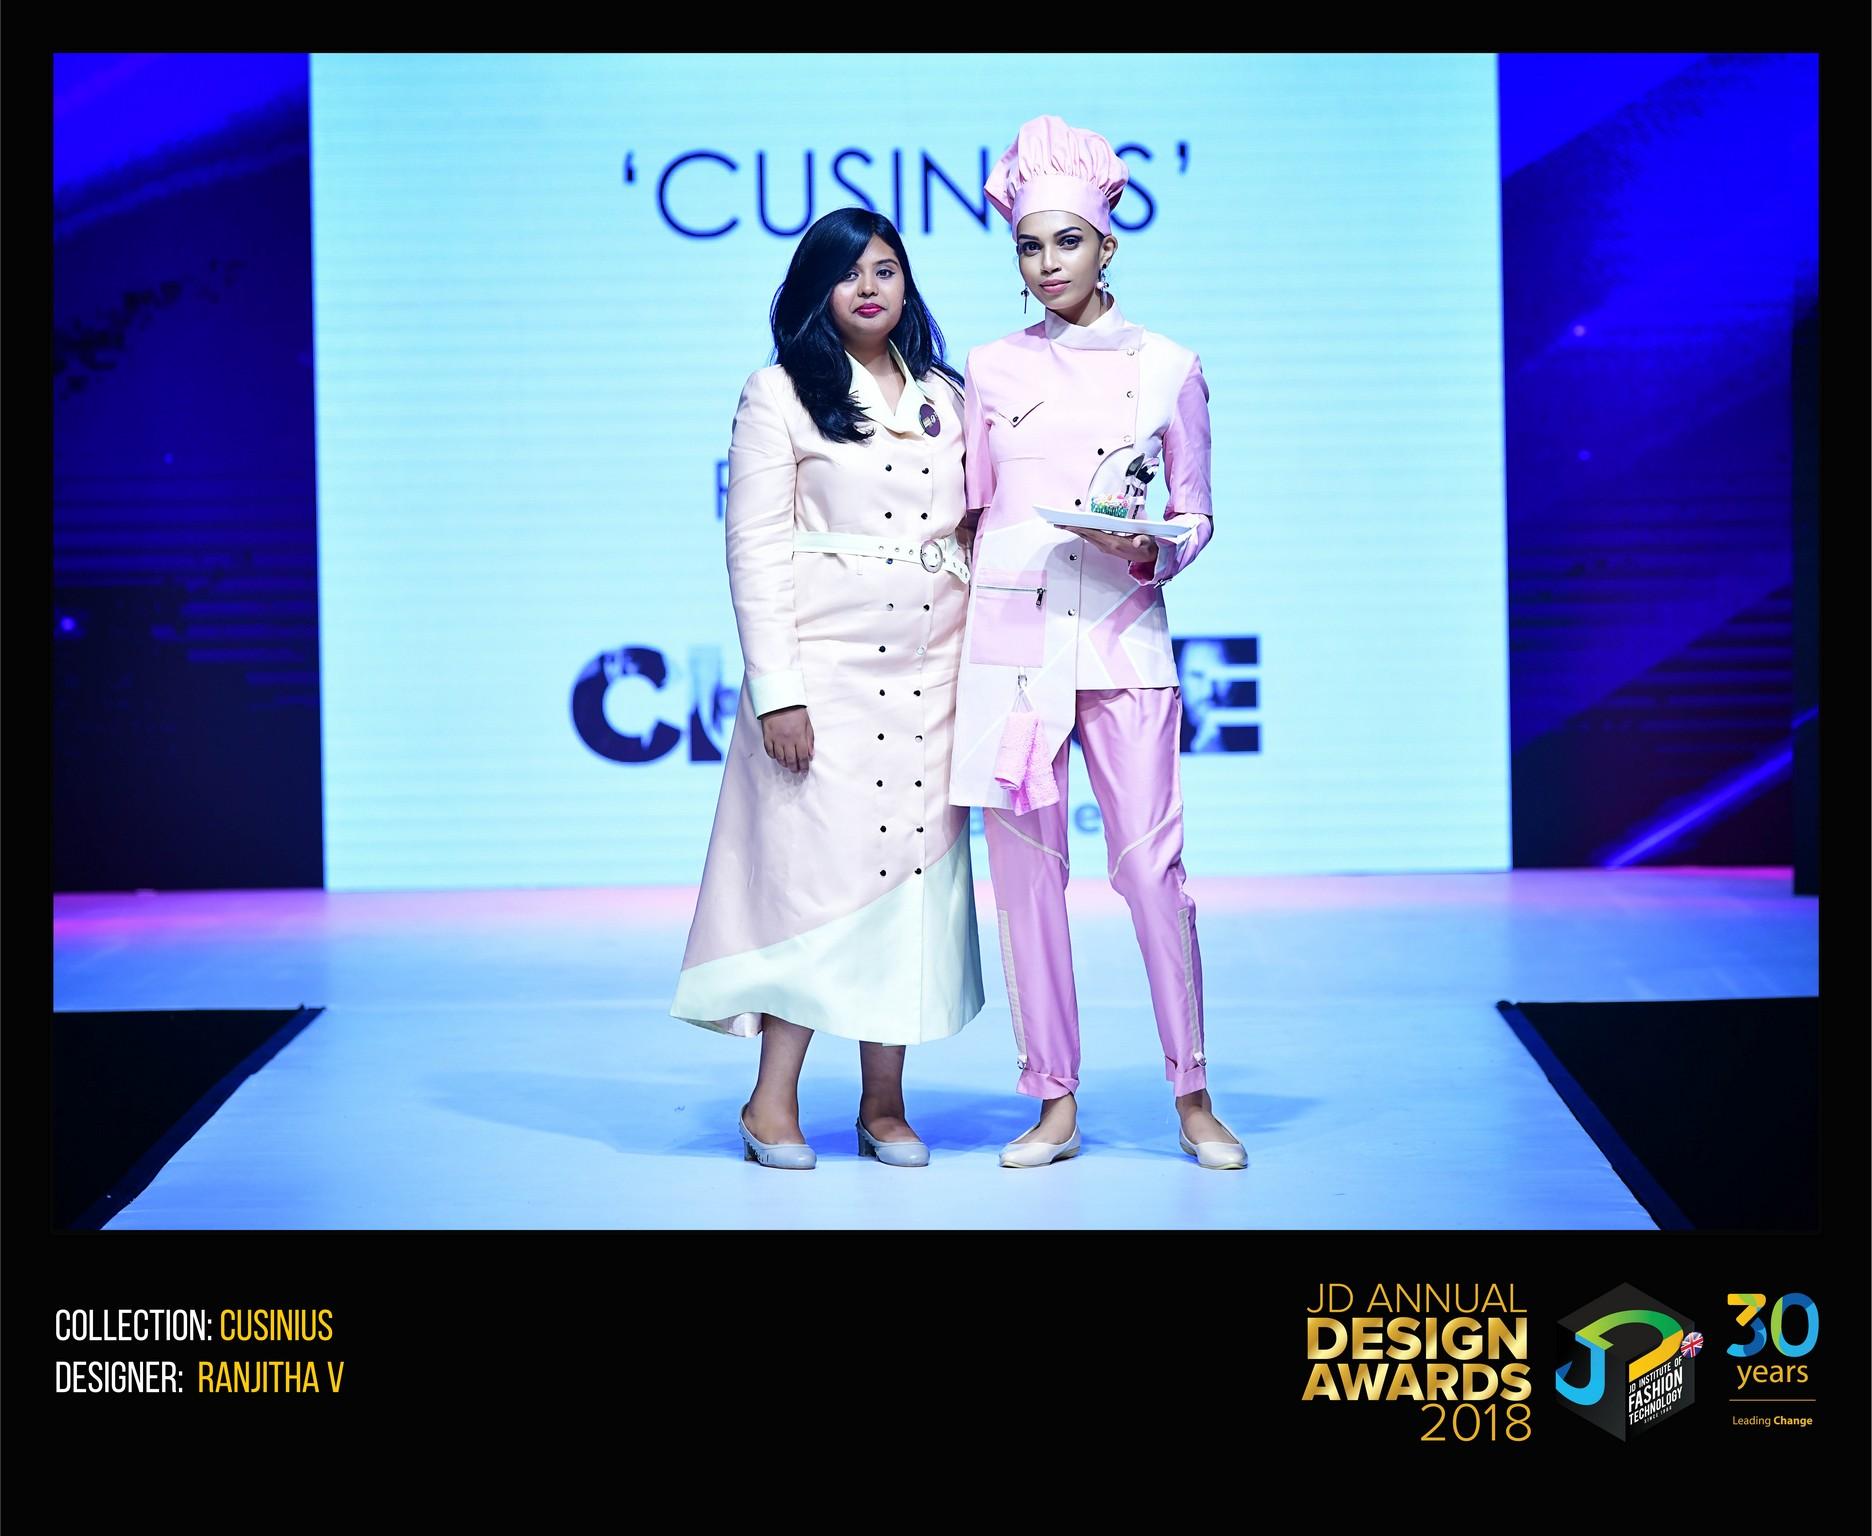 Cusinius – Change – JD Annual Design Awards 2018 | Designer: Ranjitha | Photography : Jerin Nath (@jerin_nath) cusinius - CUSINIUS 11 - Cusinius – Change – JD Annual Design Awards 2018